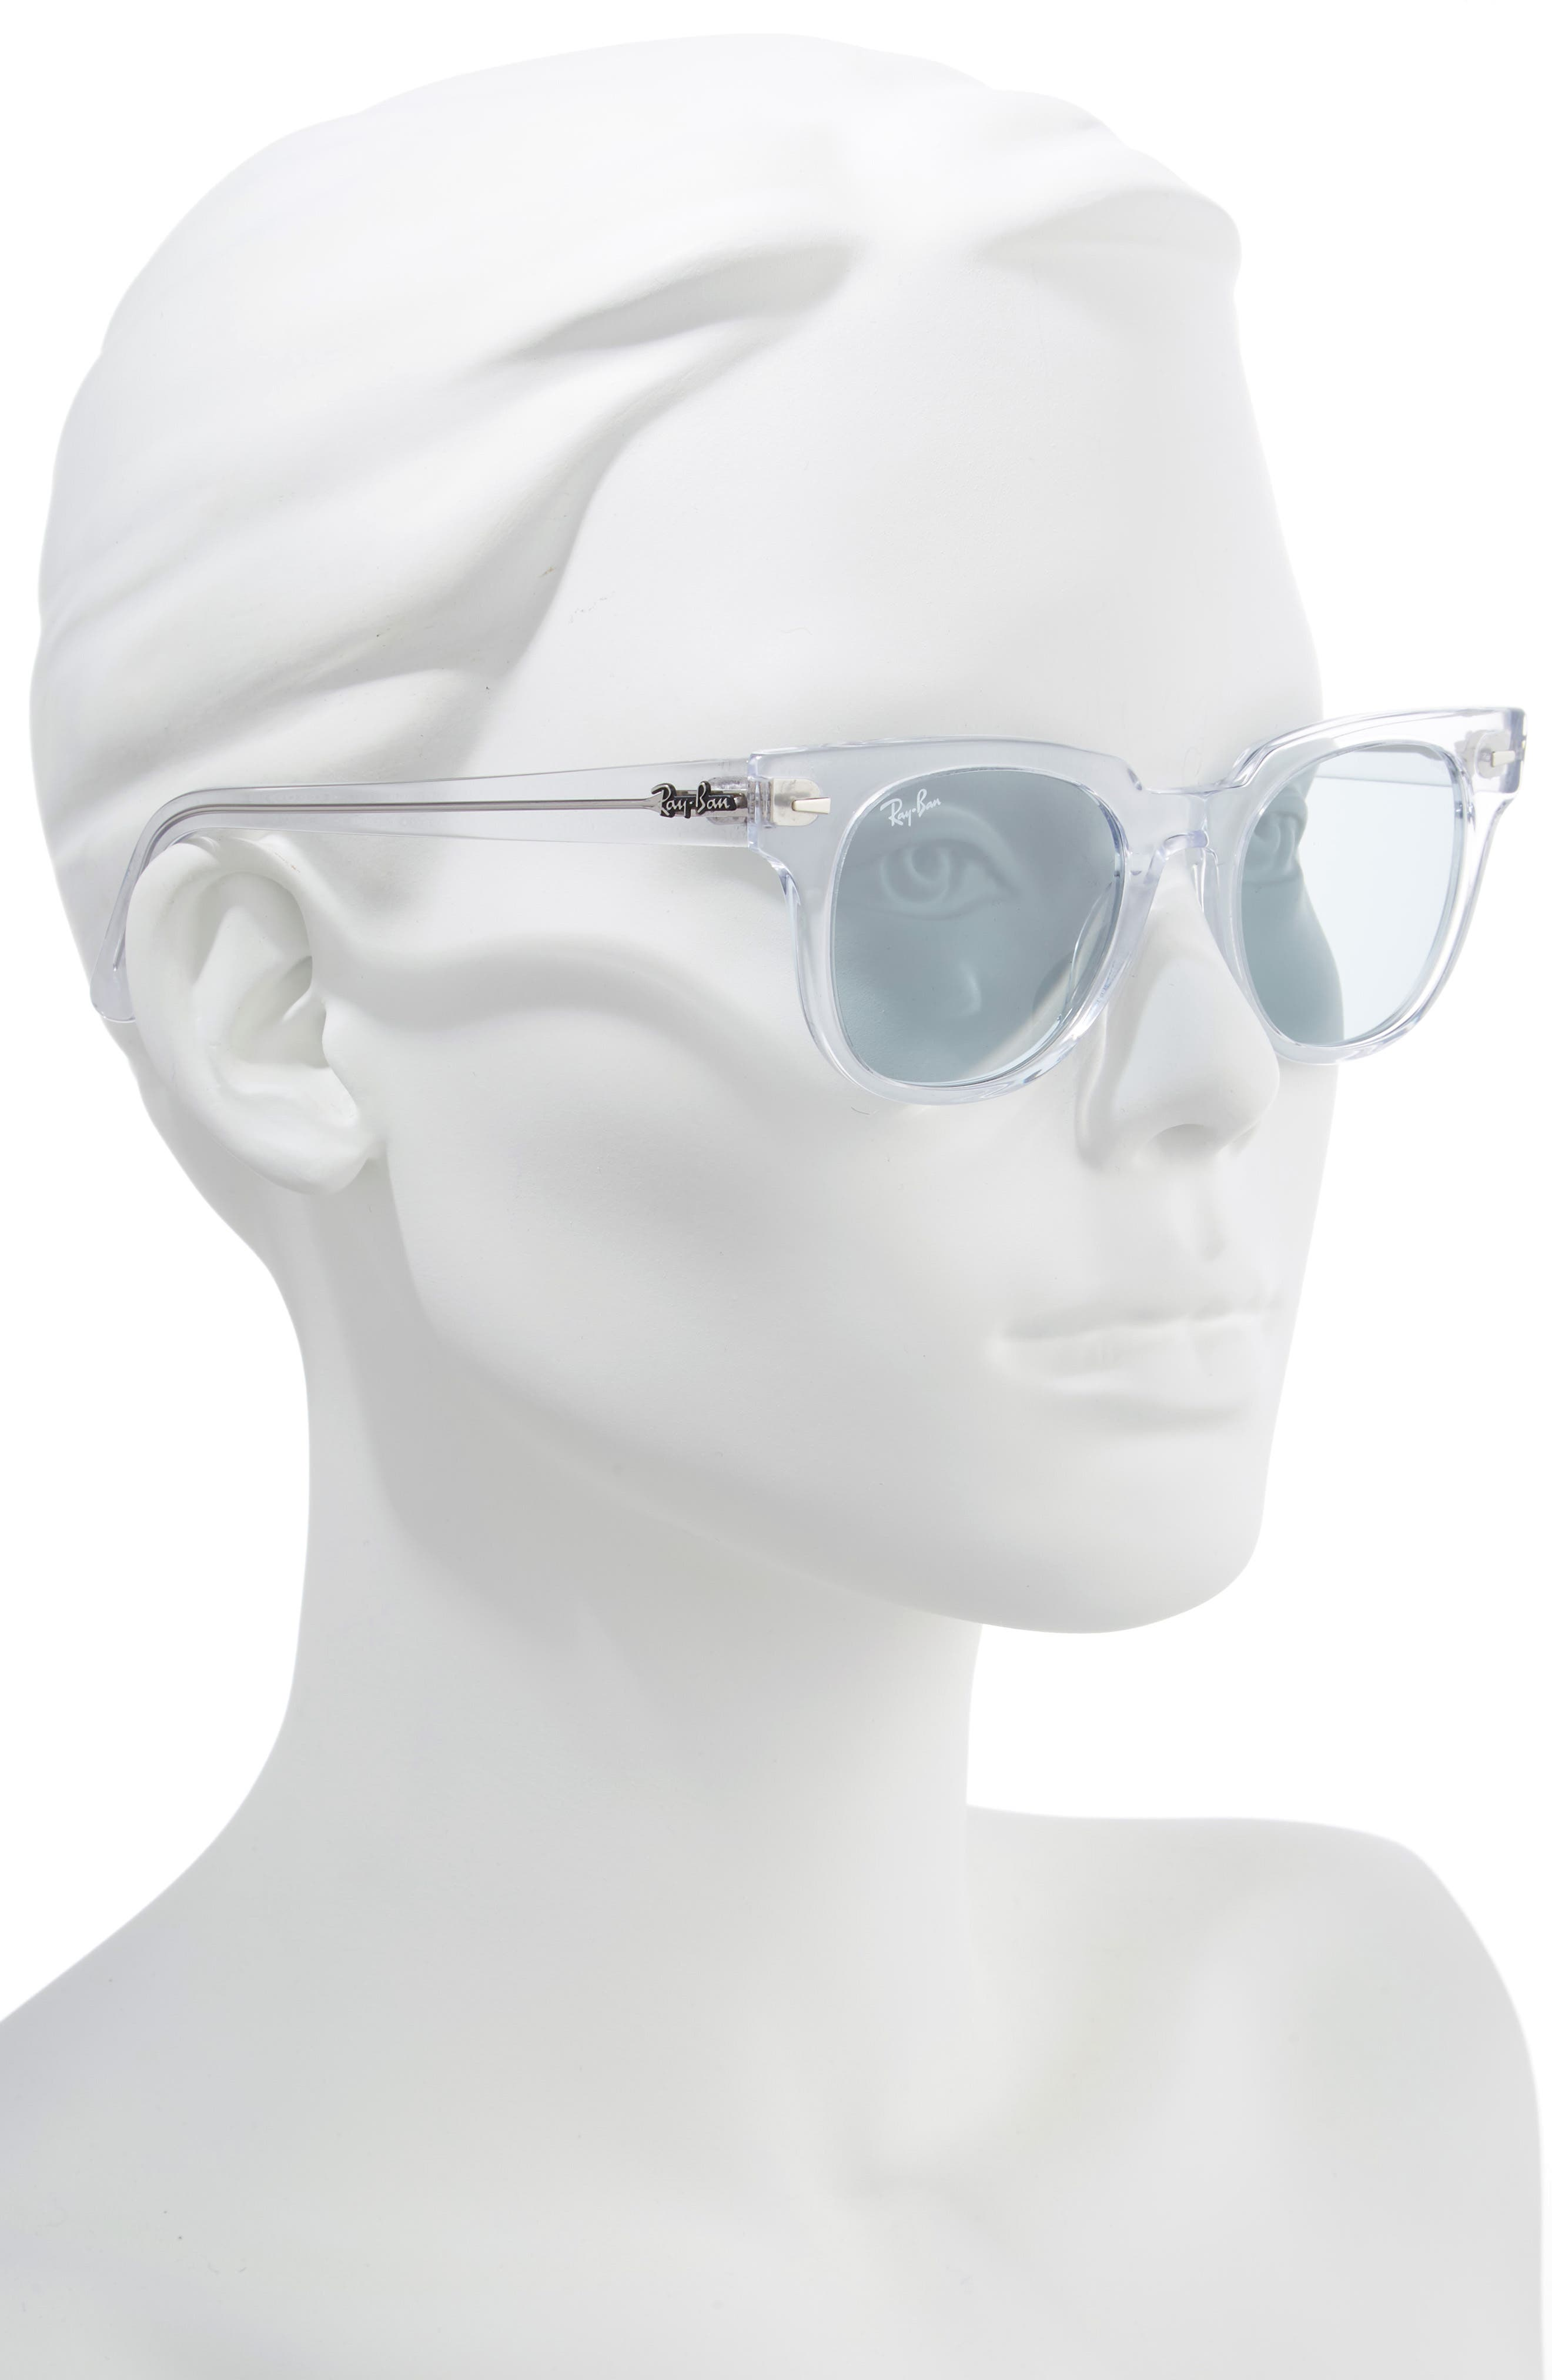 RAY-BAN, Meteor 50mm Wayfarer Photochromic Sunglasses, Alternate thumbnail 2, color, CRYSTAL/ BLUE SOLID